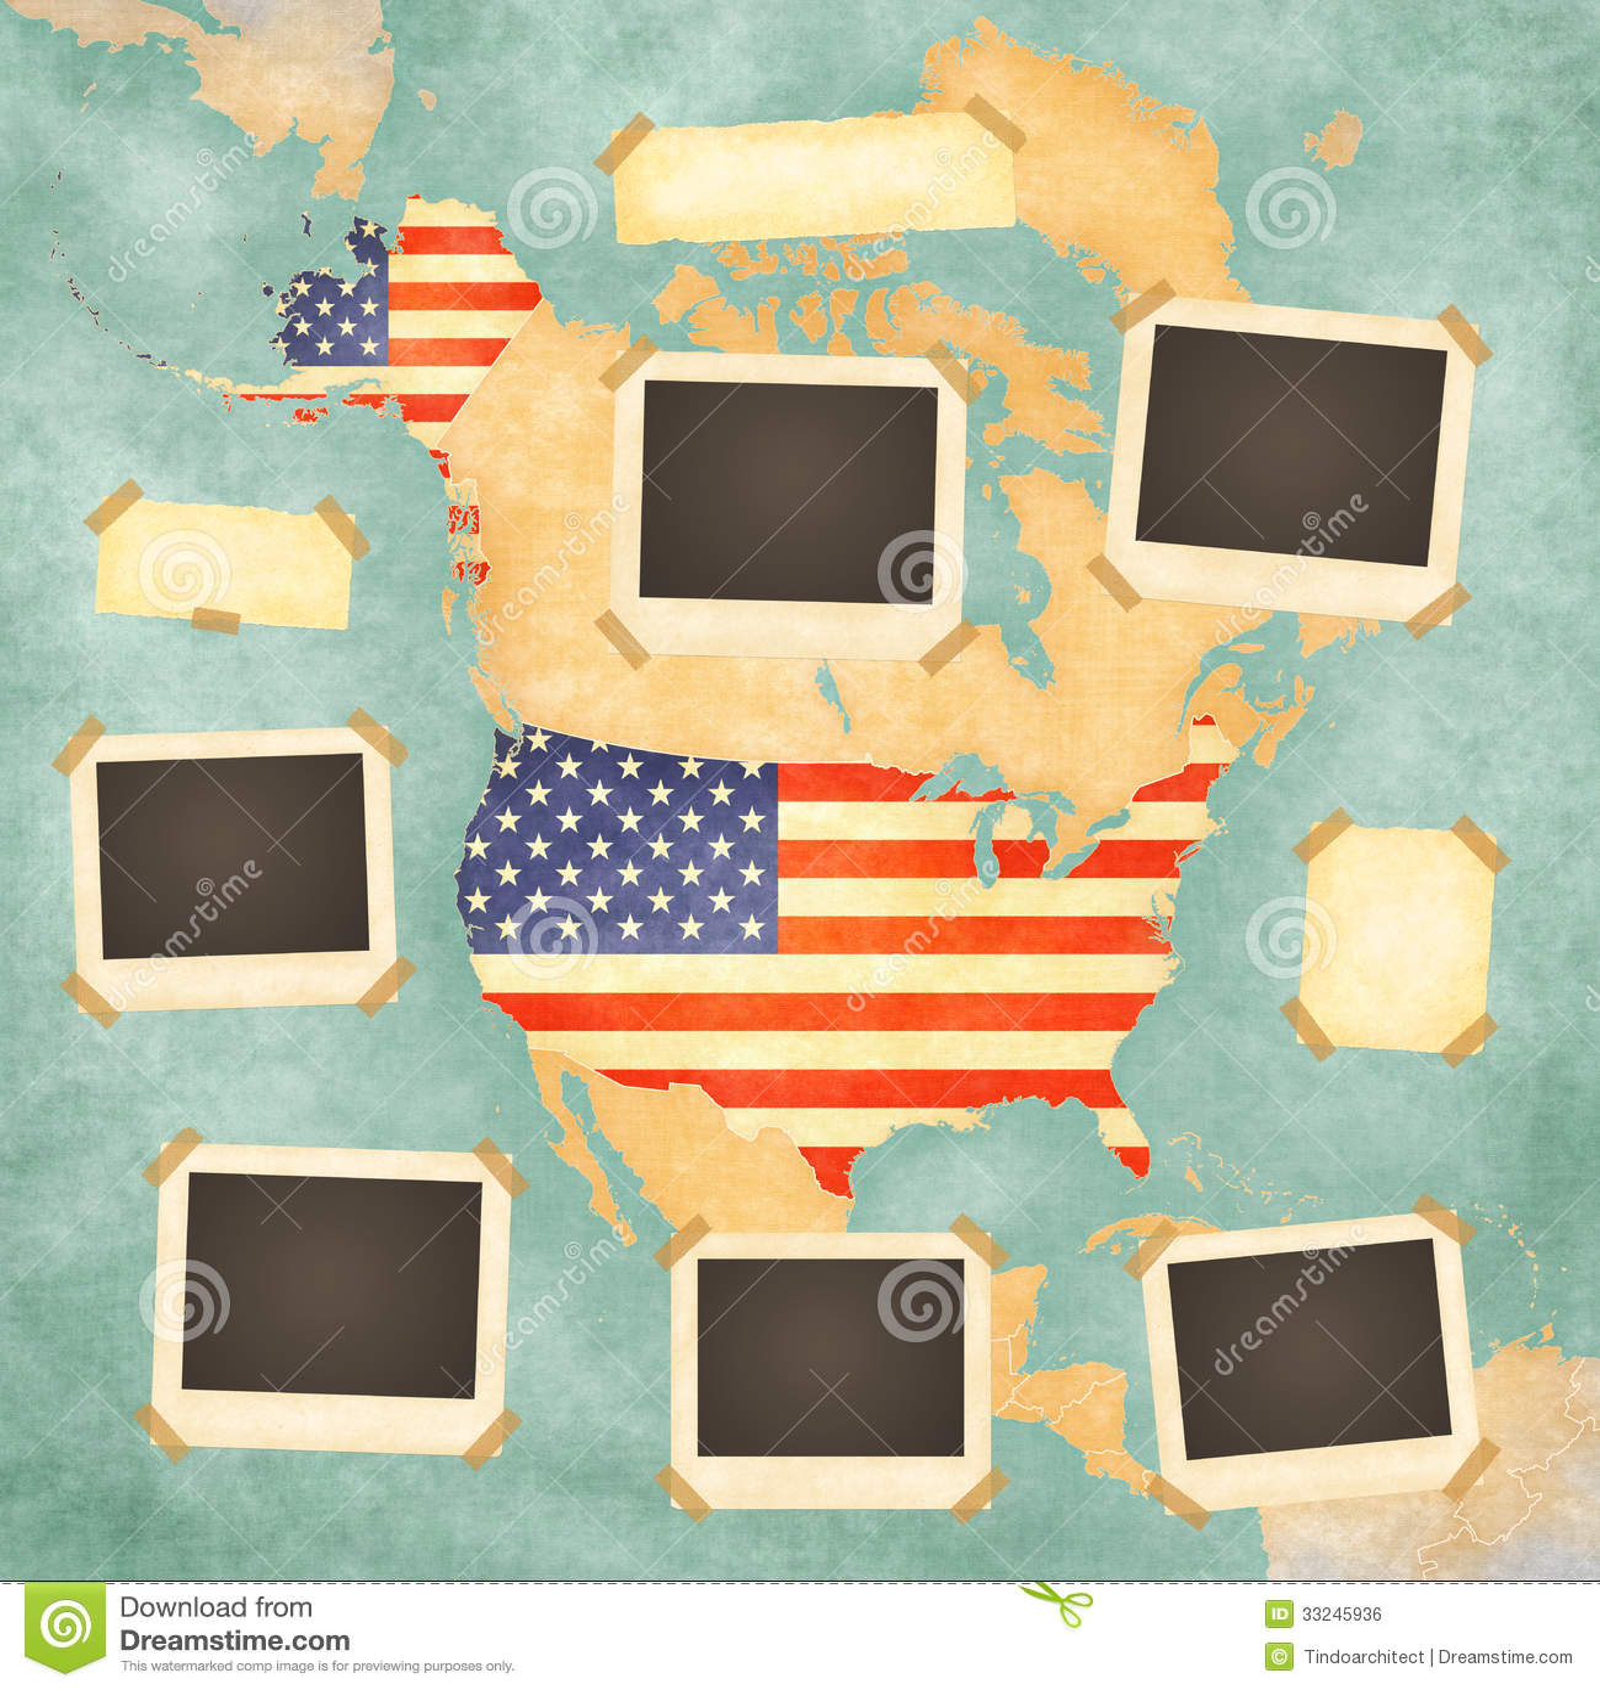 Vintage Photo Frames USA Stock Photo Illustration Of Photos - United states map picture frame